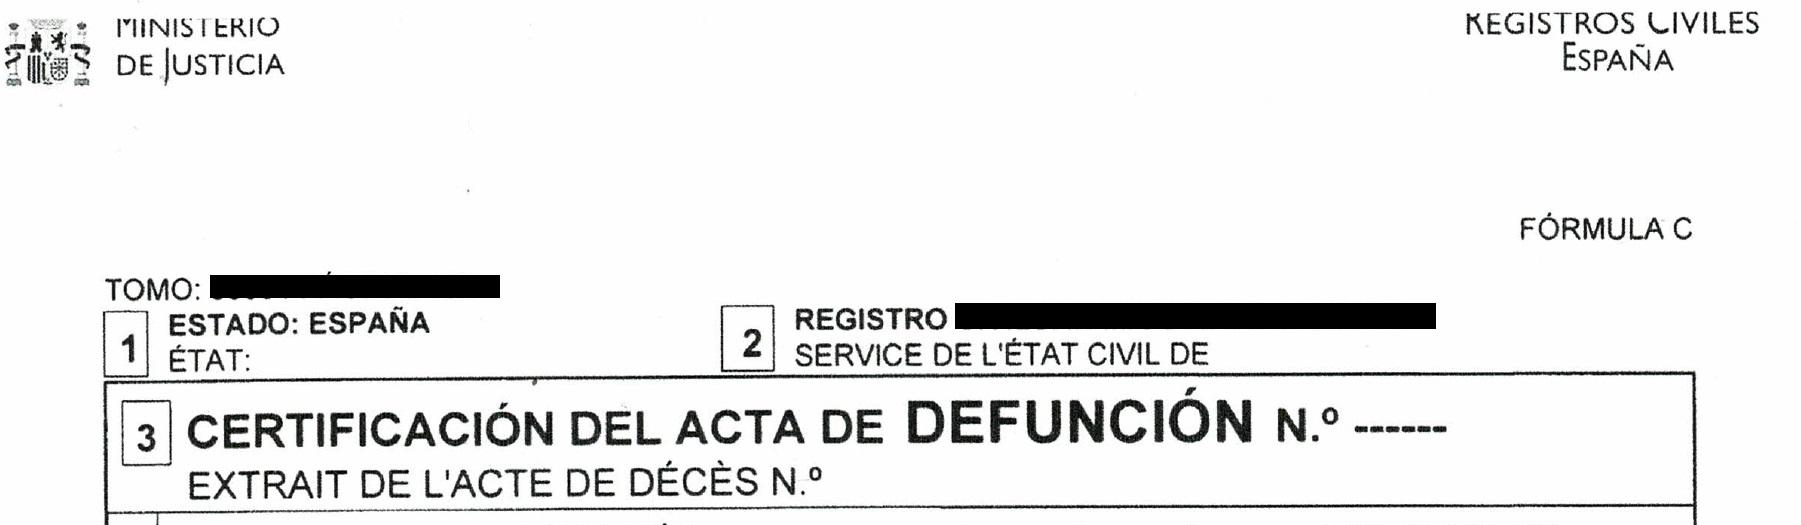 Spanish Death Certificate